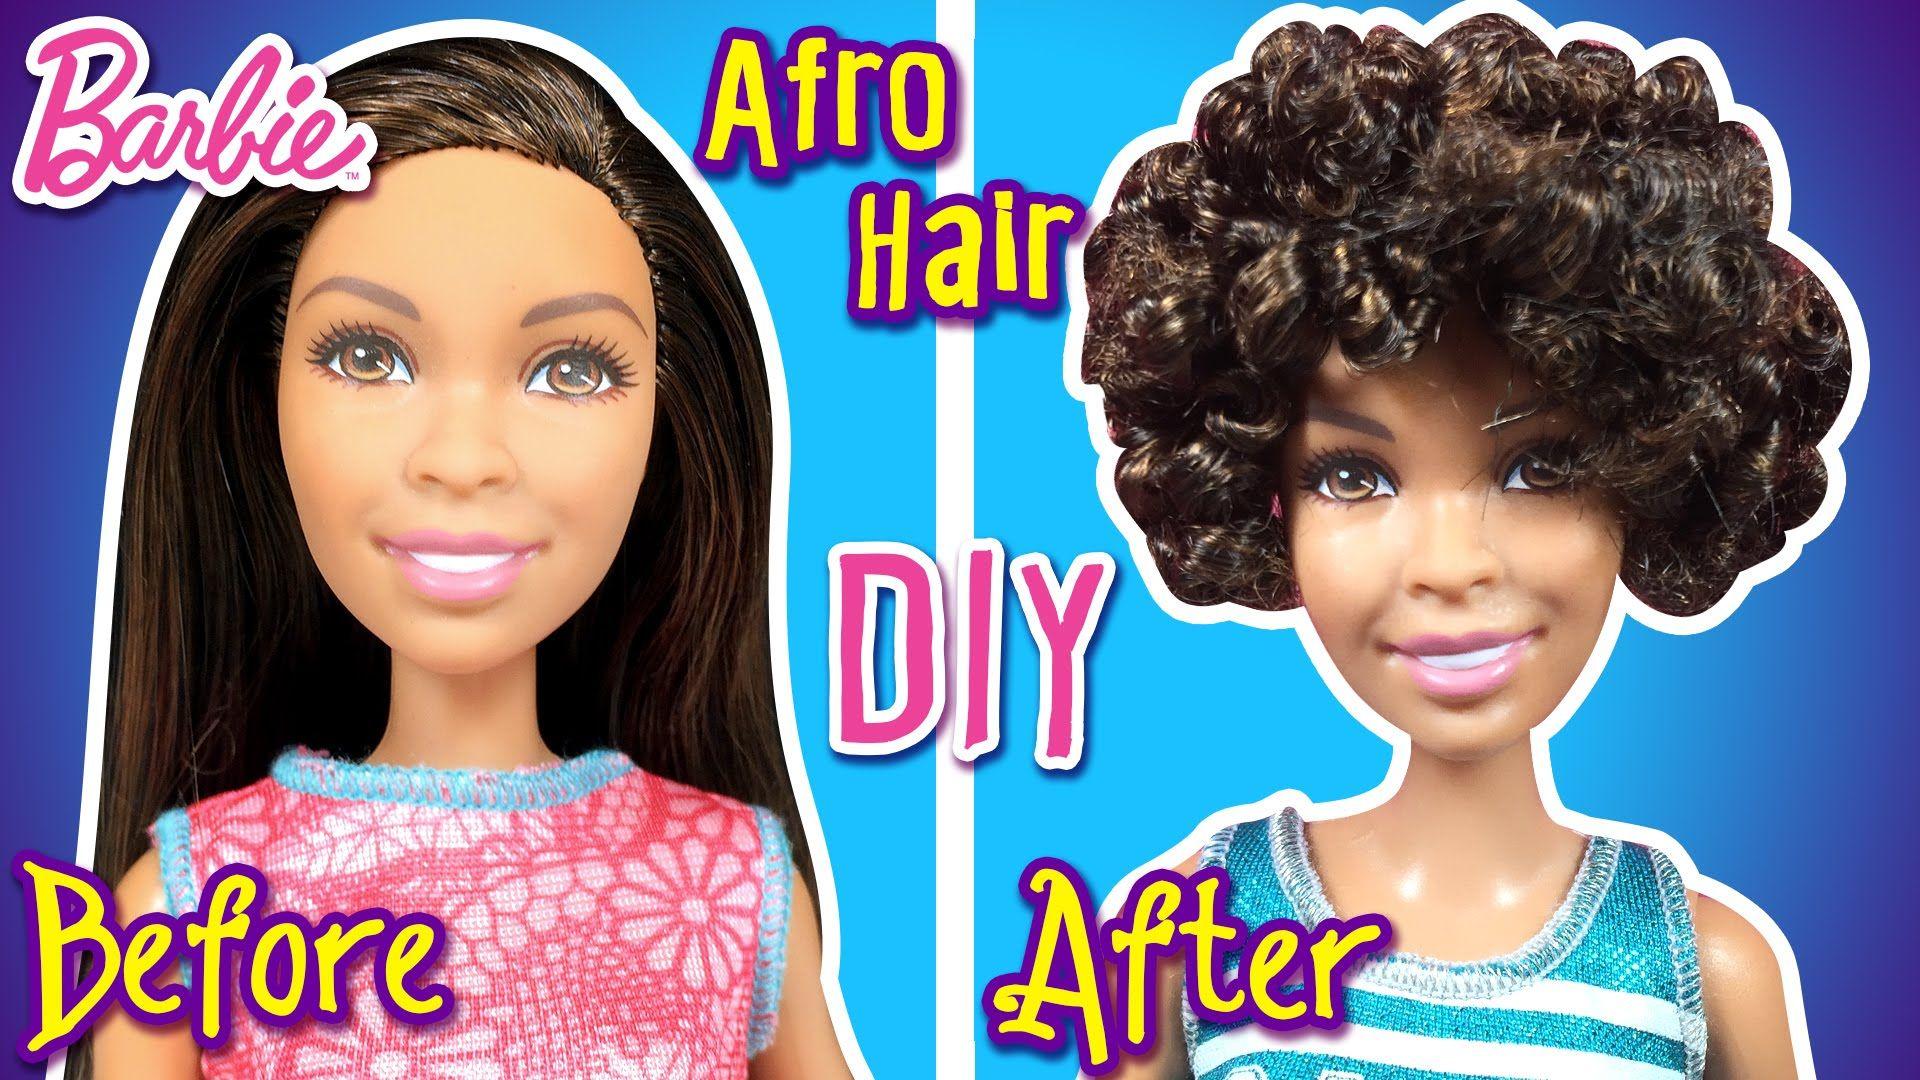 How To Cornrow Braid with Barbie Doll DIY Barbie Hairstyles